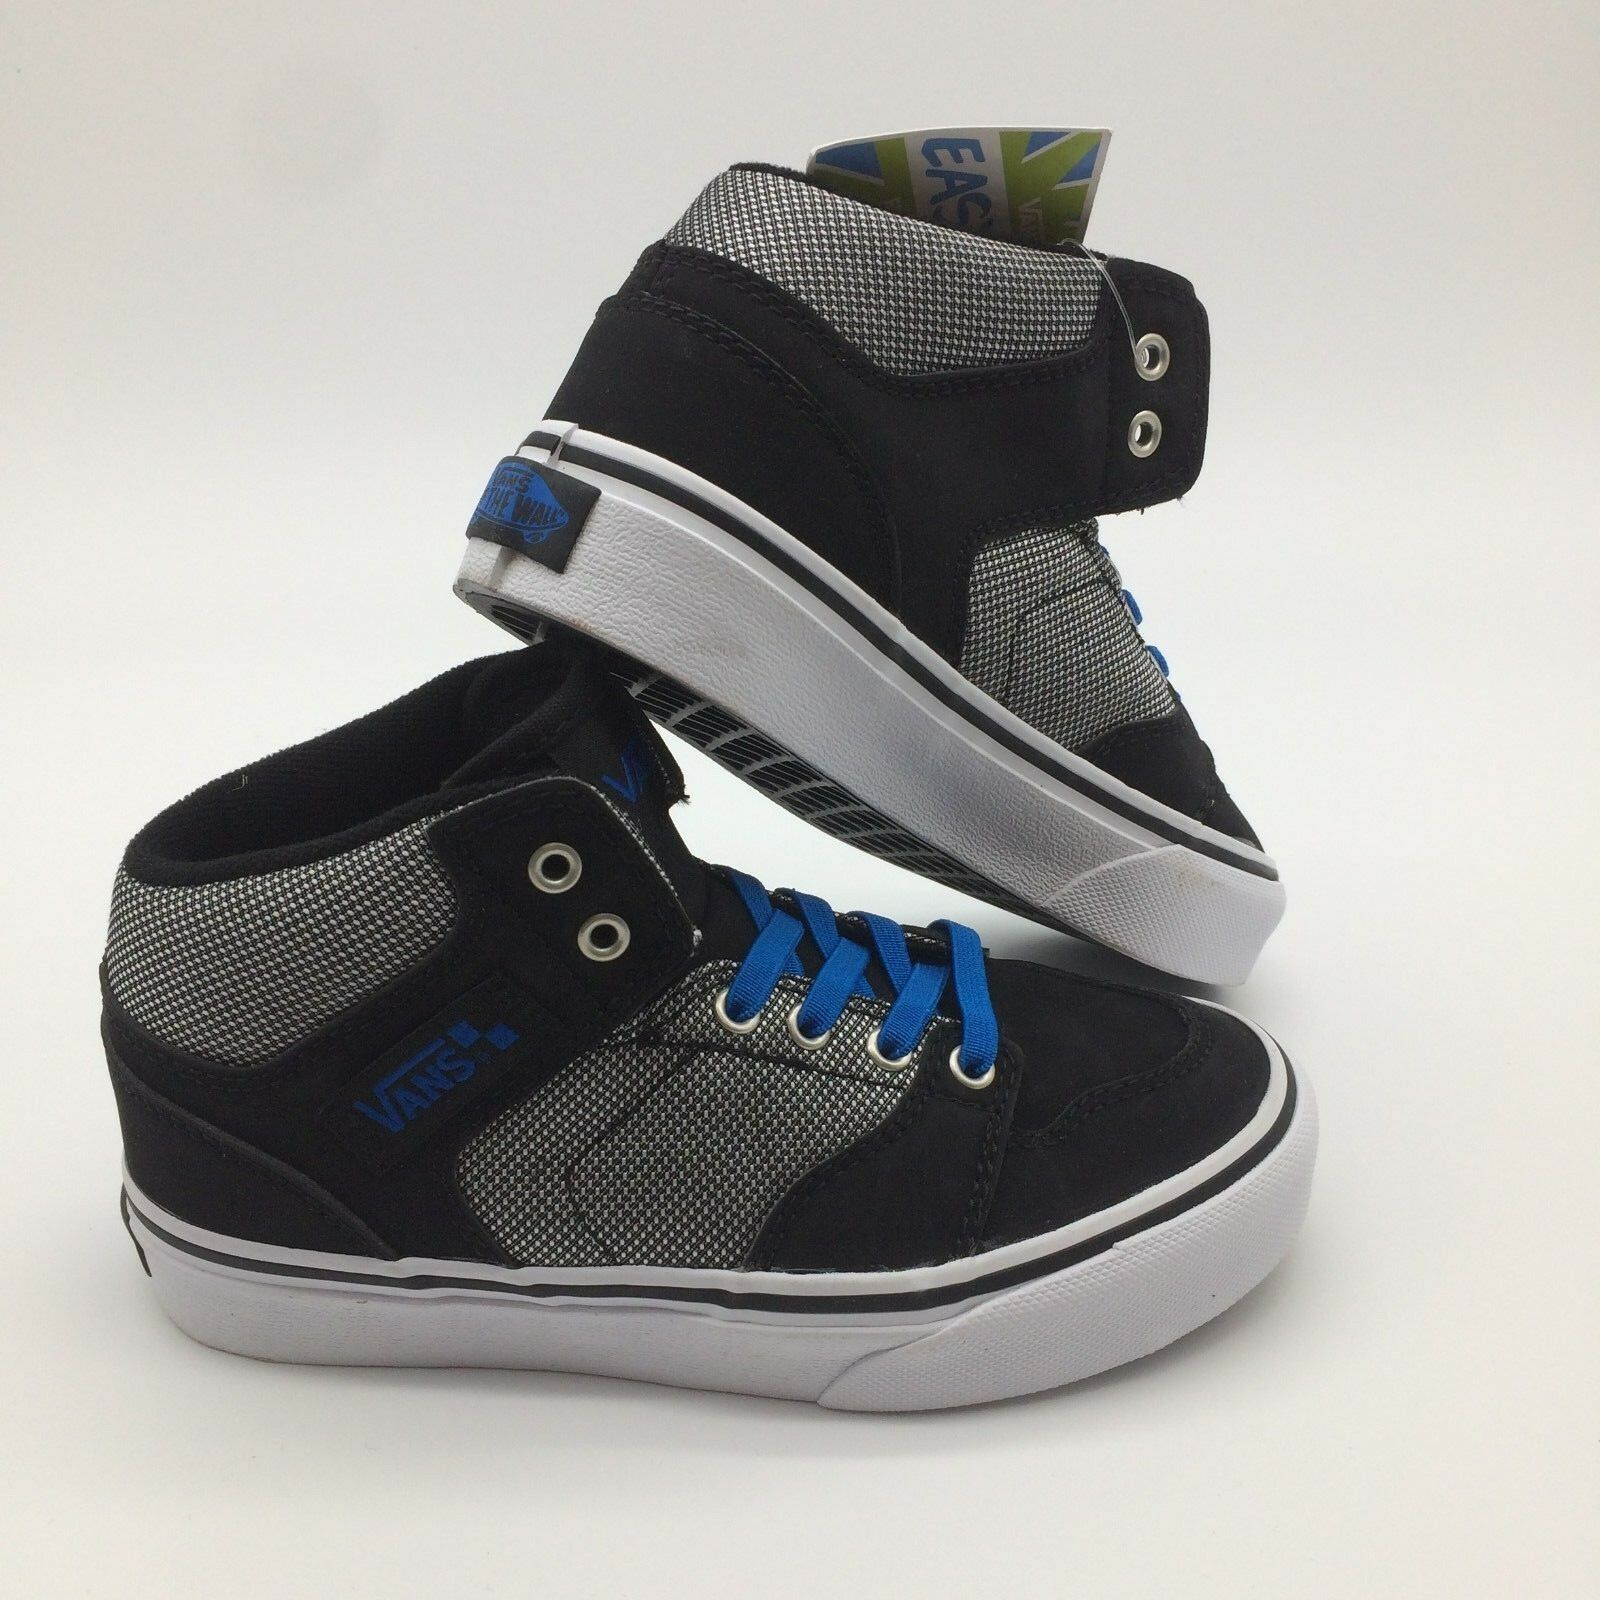 03b06dfe84b1 Vans Youth Kids Shoes